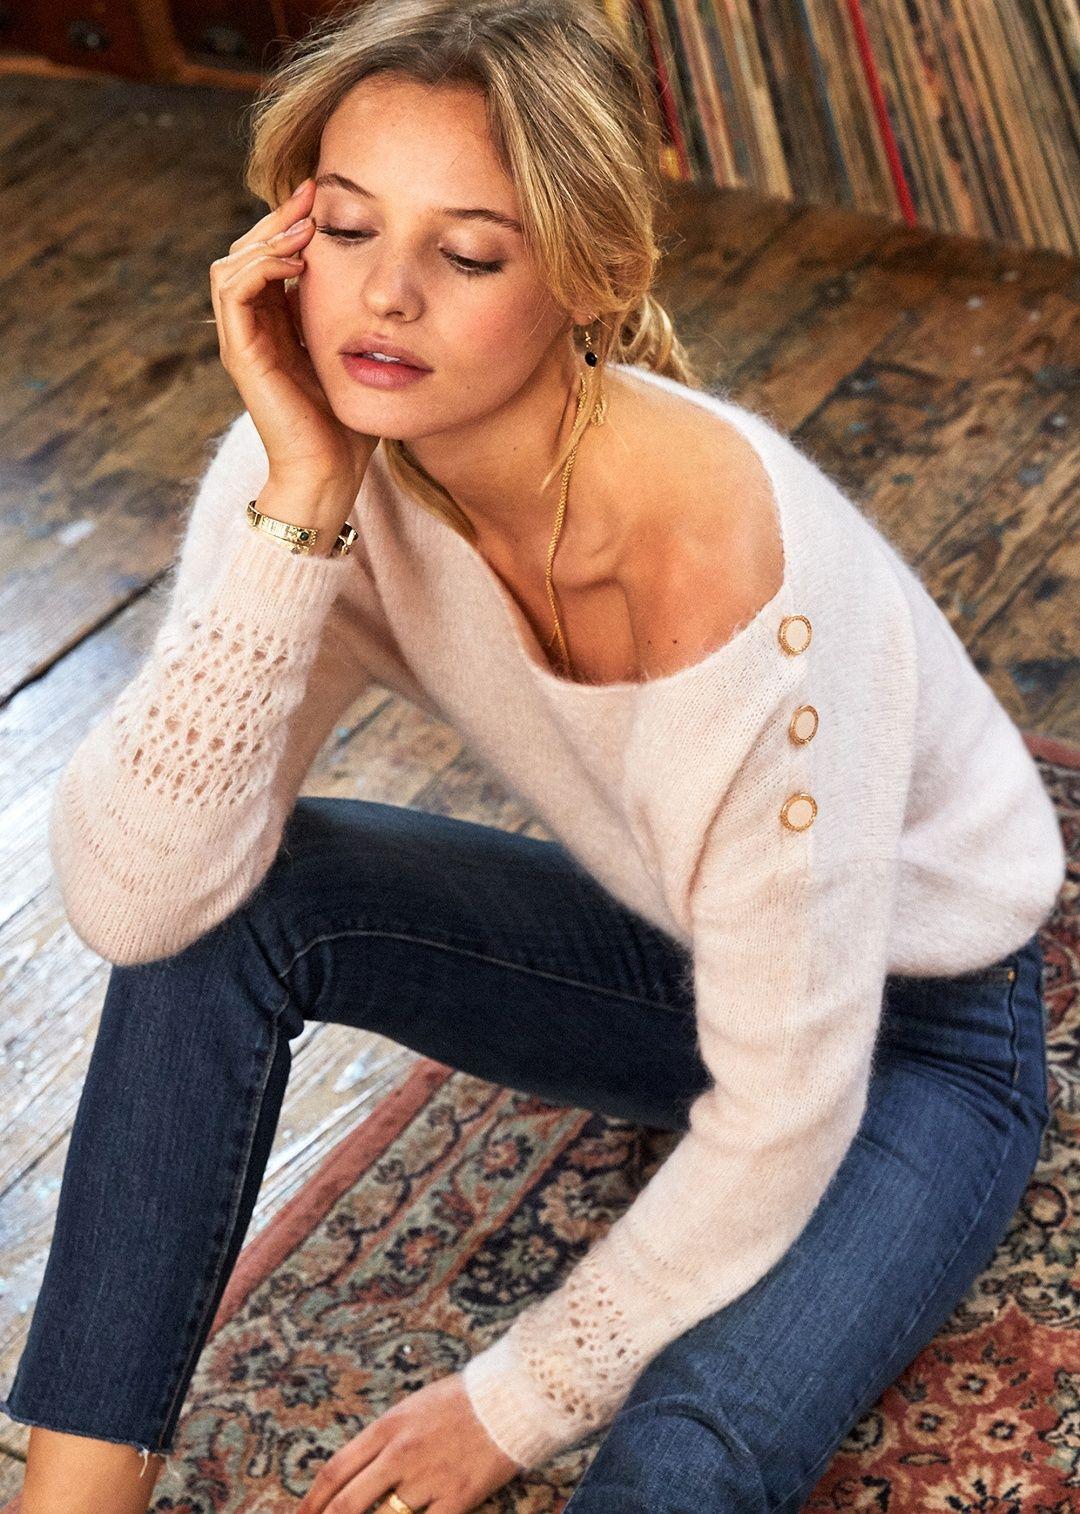 Sezane Cheryl Jumper With Images Sweater Fashion Fashion